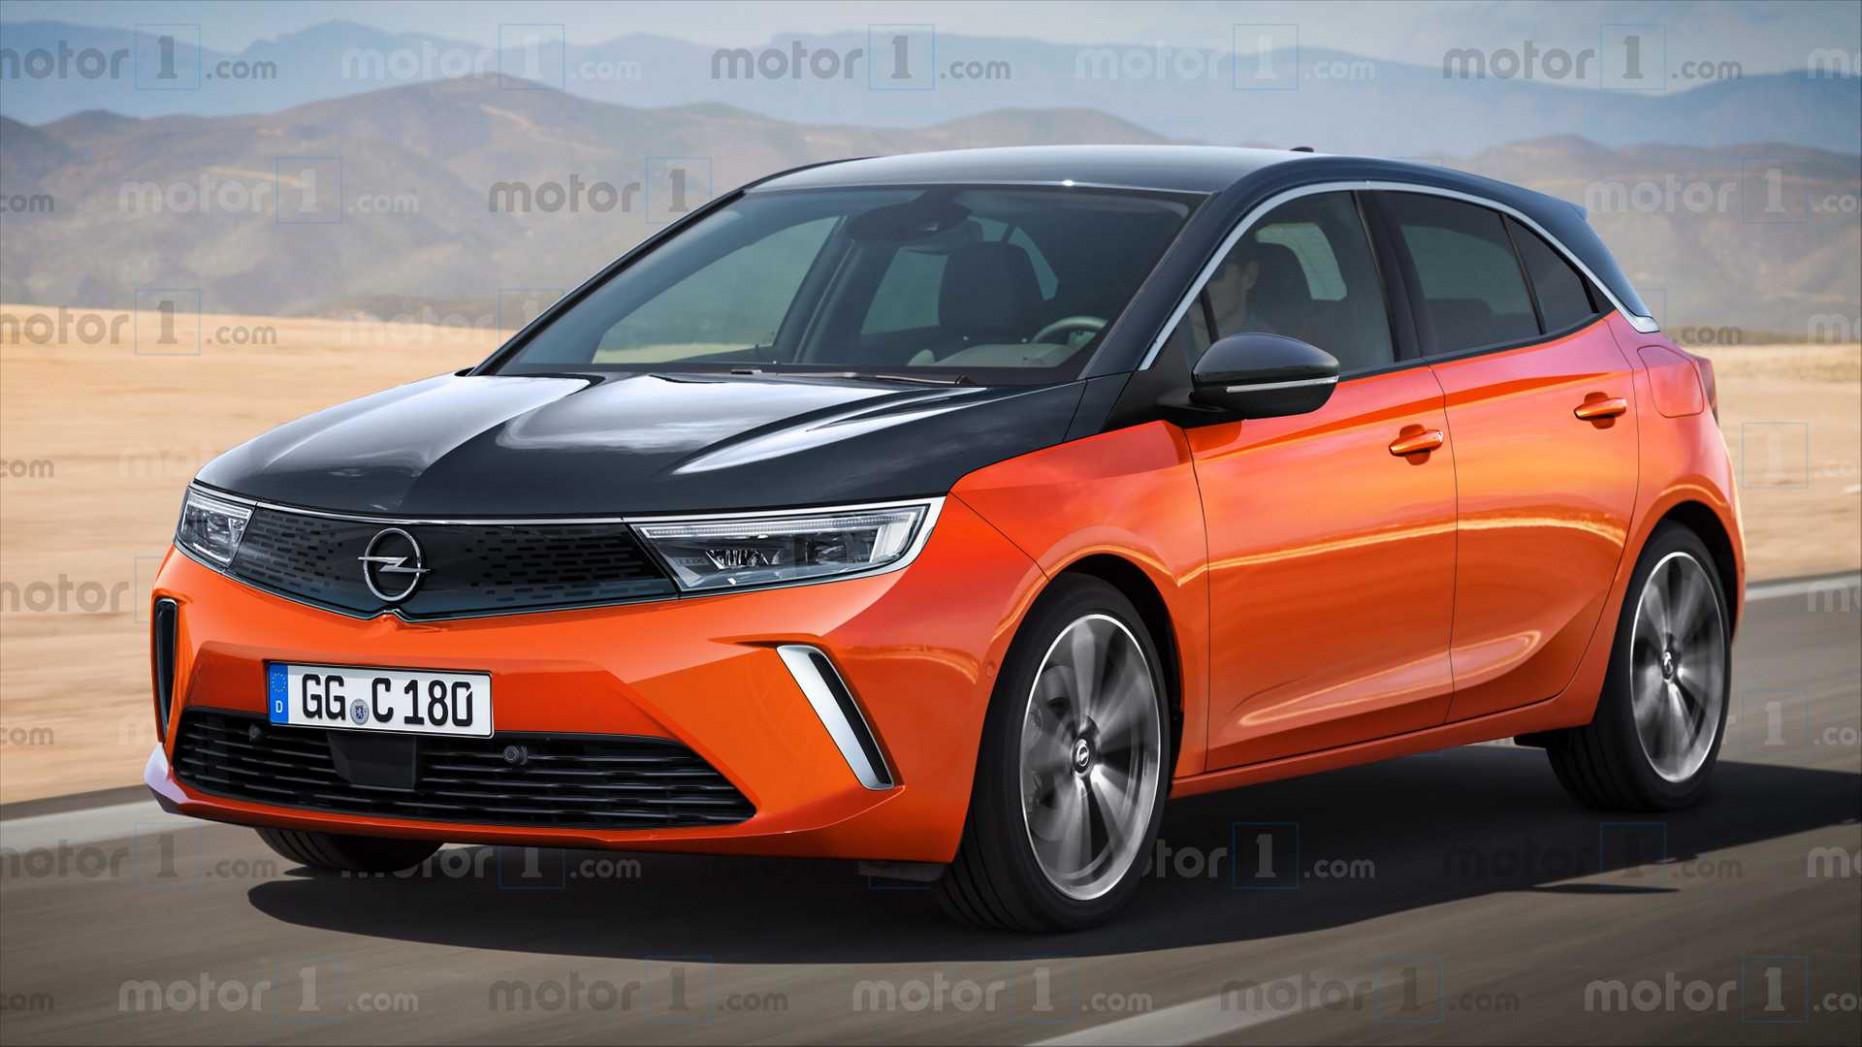 Rumors 2022 Opel Corsa